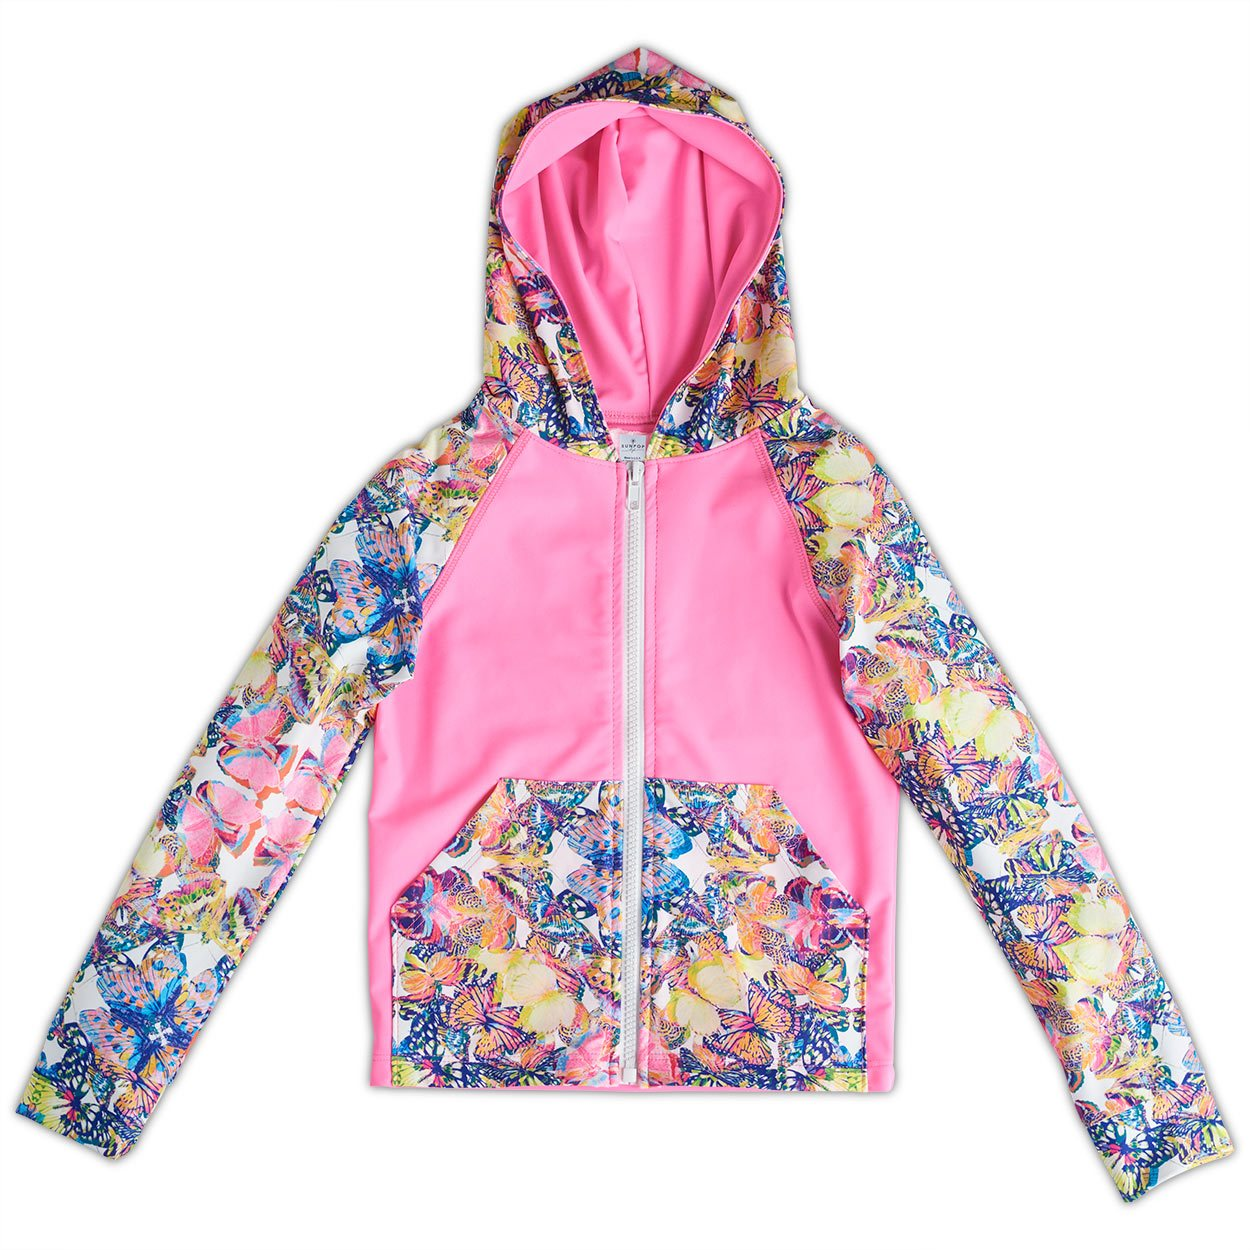 Opaline World Hybrid Zip Up Hoodie Upf50 Kids Girls Size 2 12 Butterflies Pink Multicolor Sunpoplife